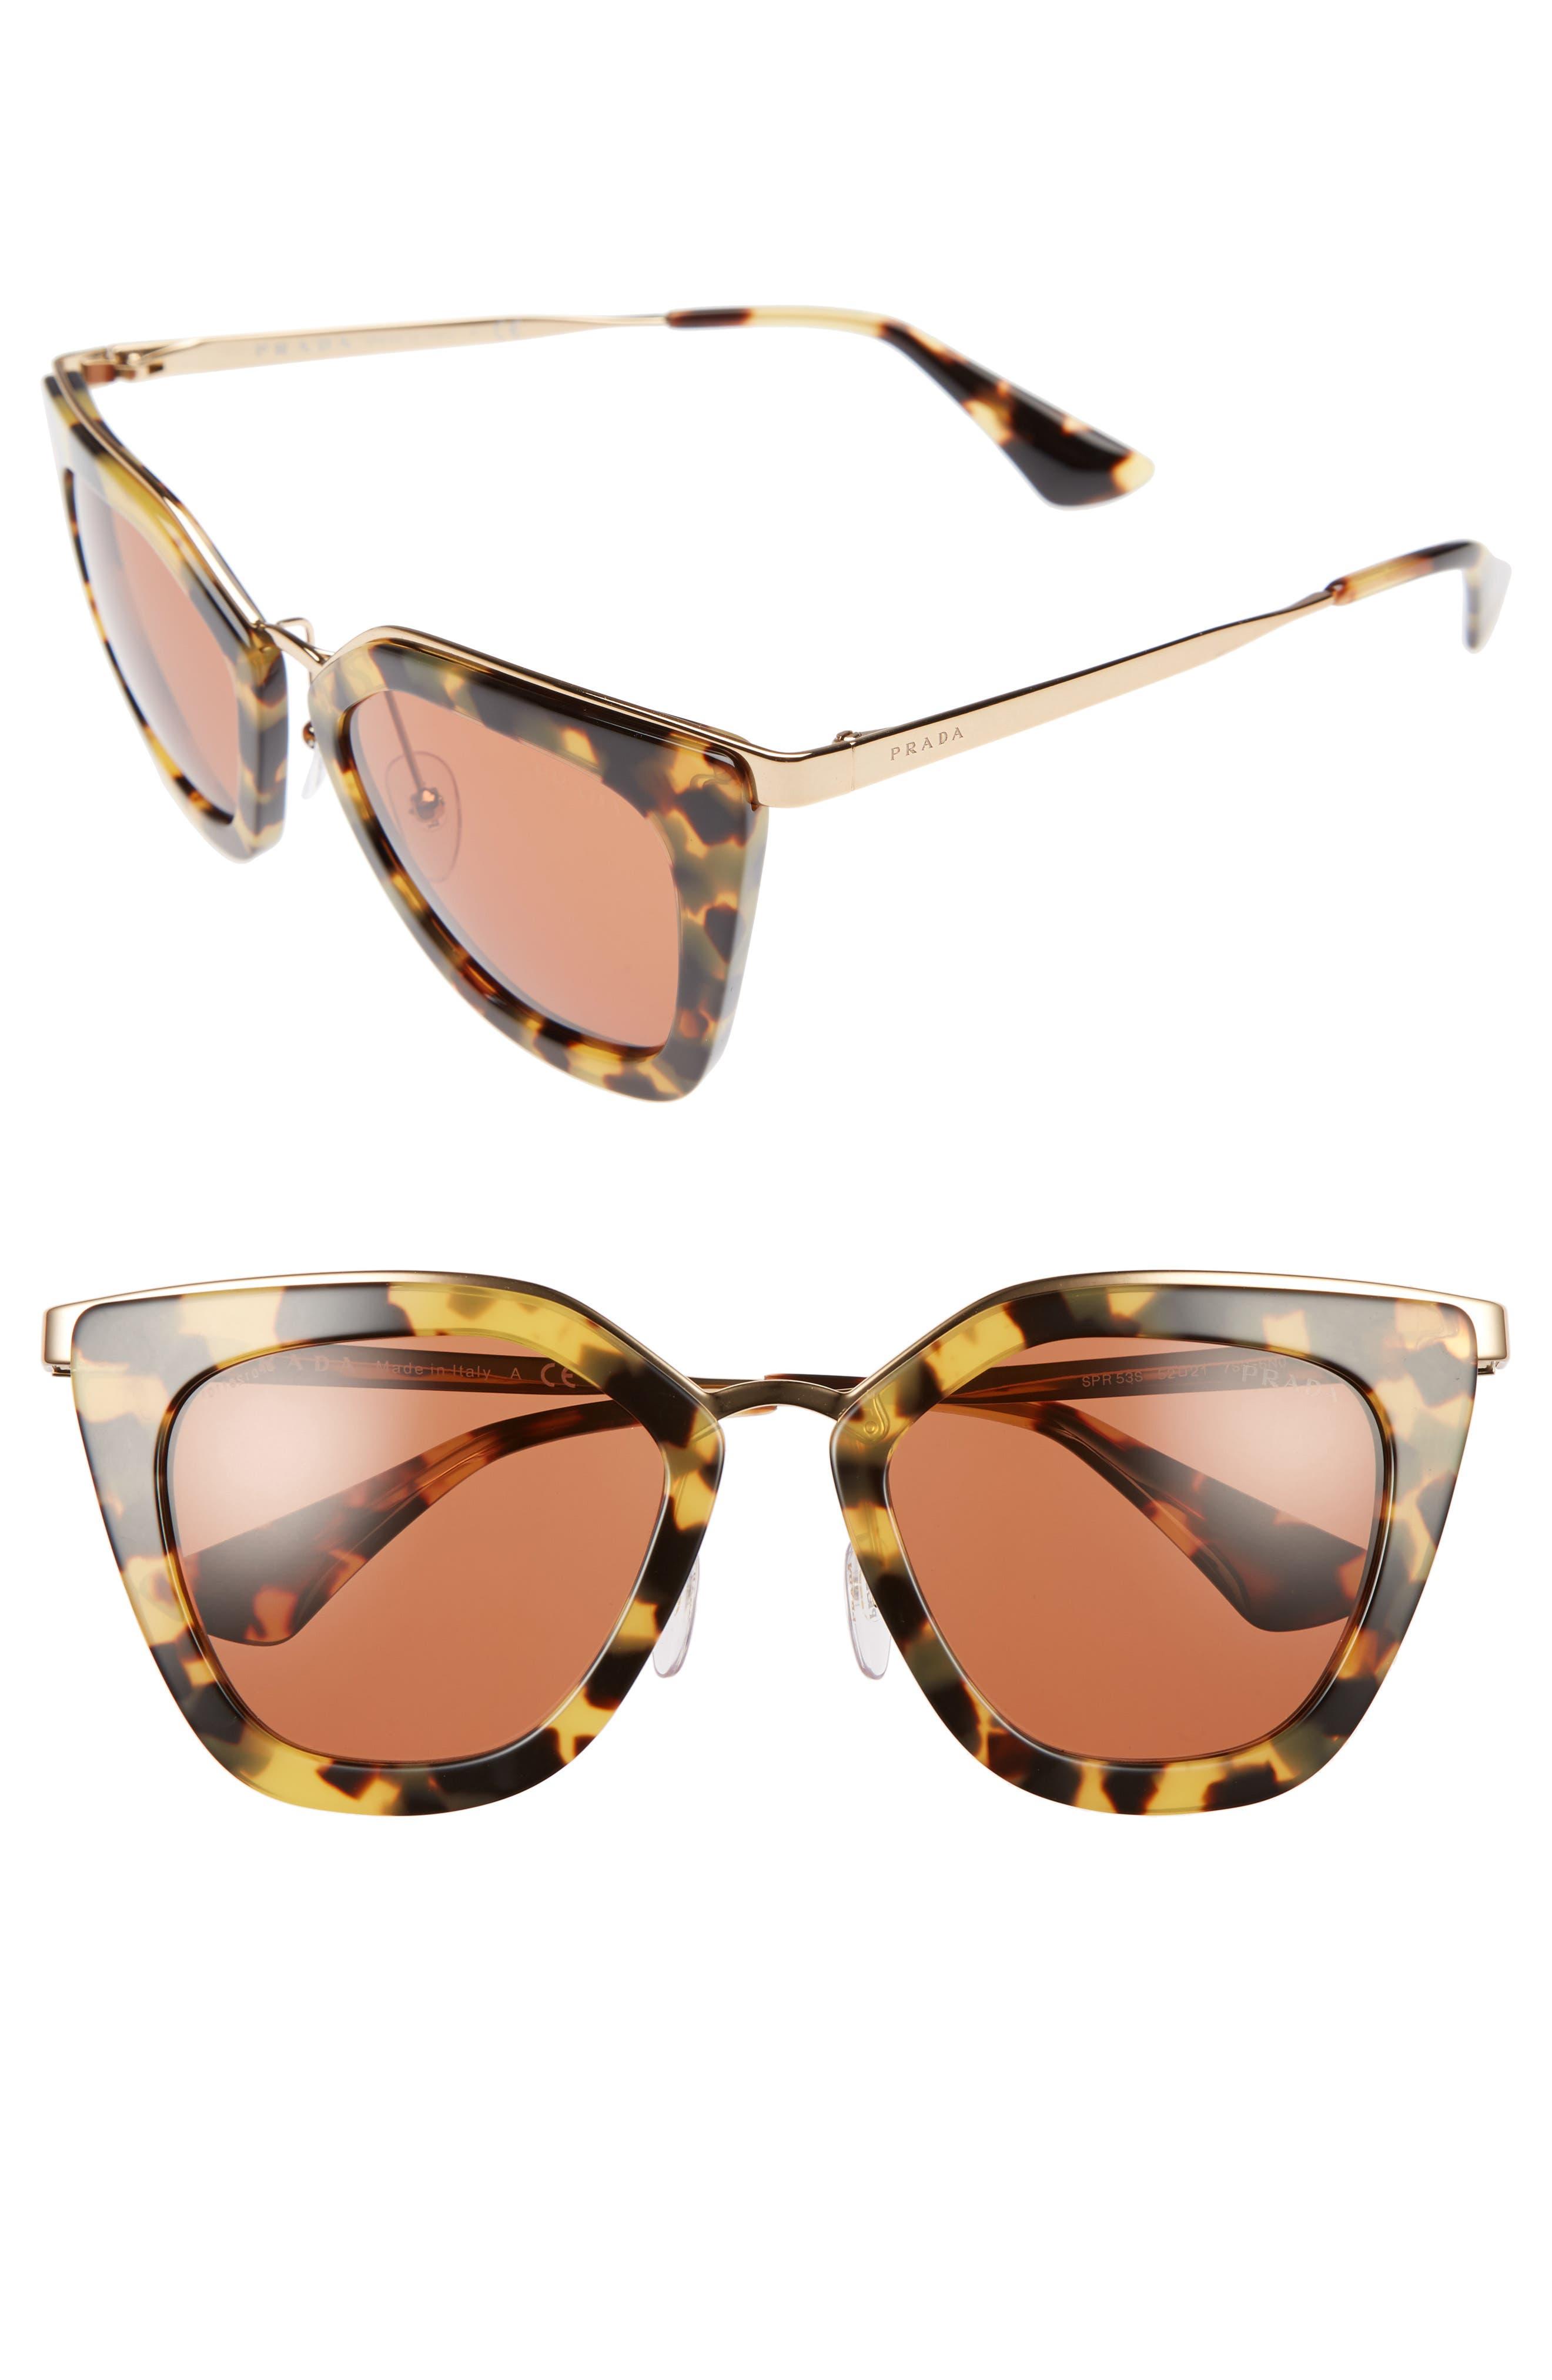 52mm Layered Frame Sunglasses,                             Main thumbnail 2, color,